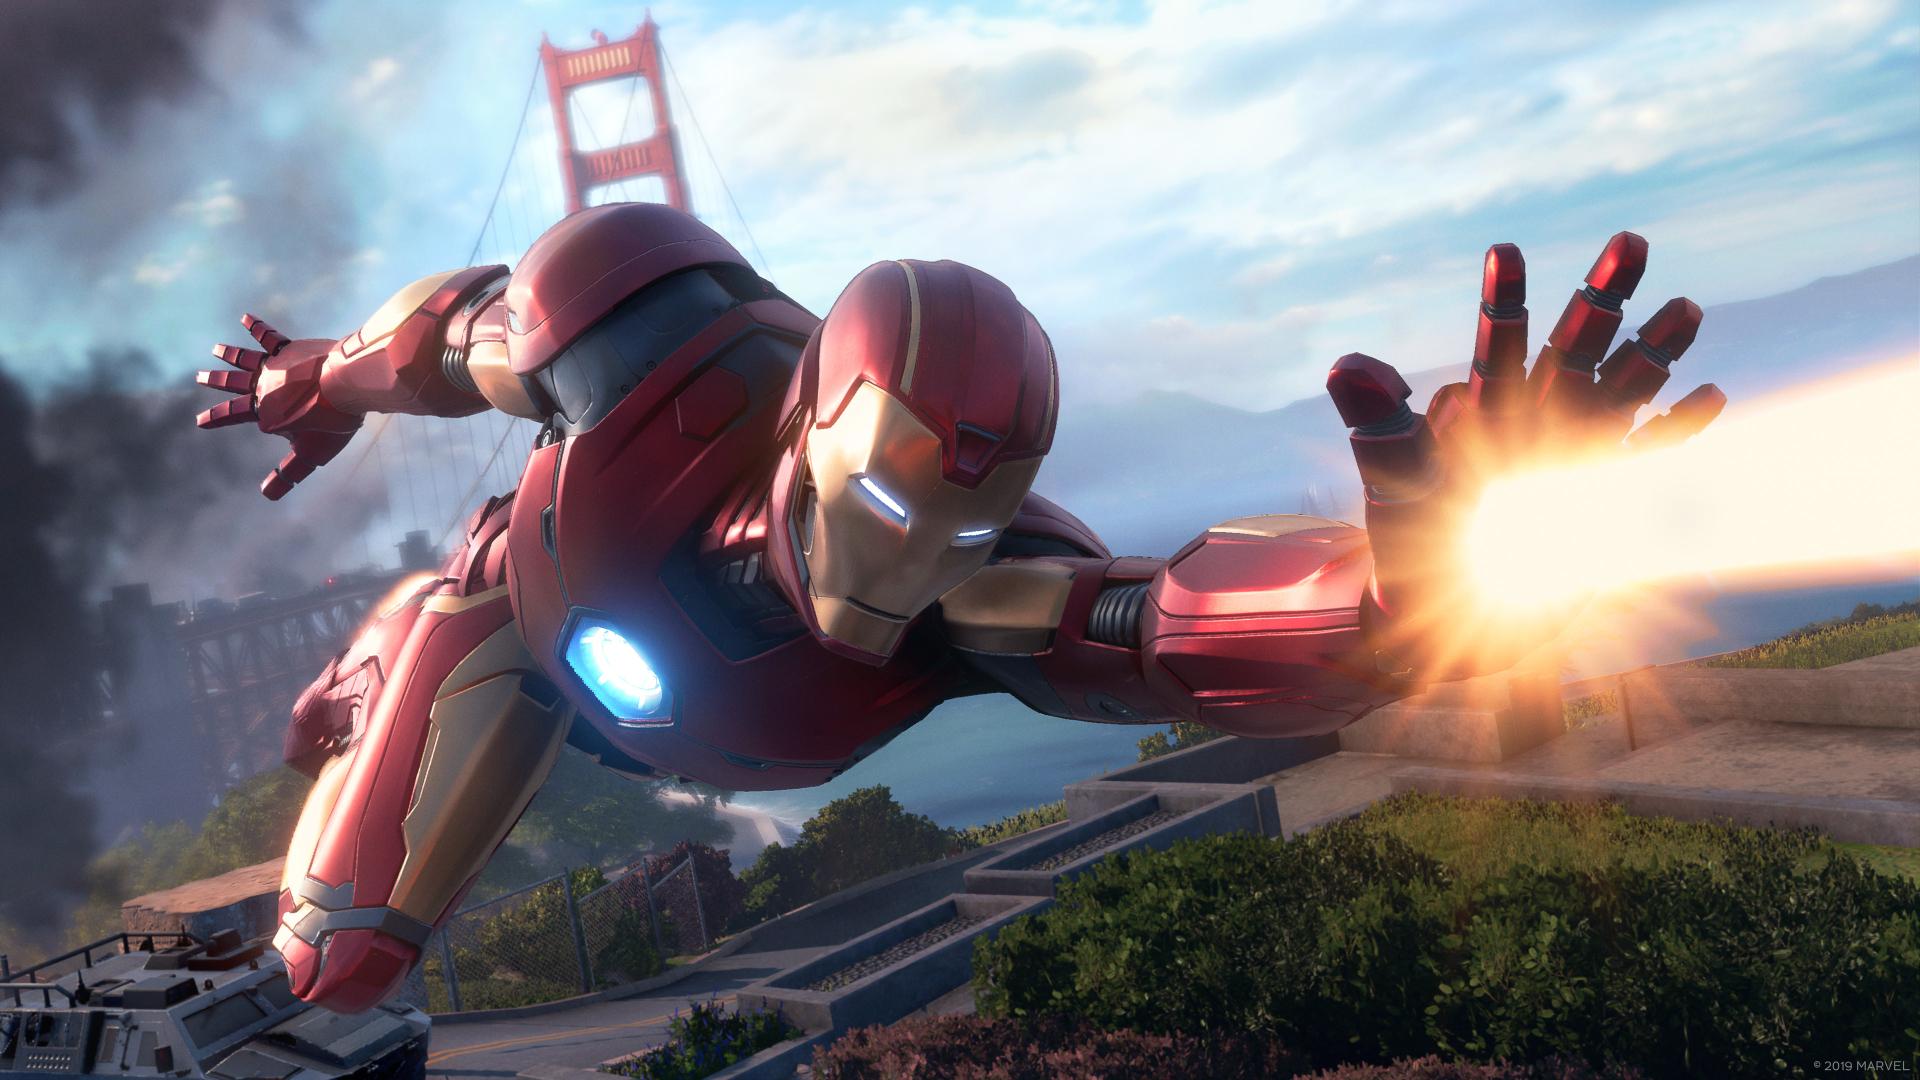 1920x1080 Marvels Avengers Iron Man 1080p Laptop Full Hd